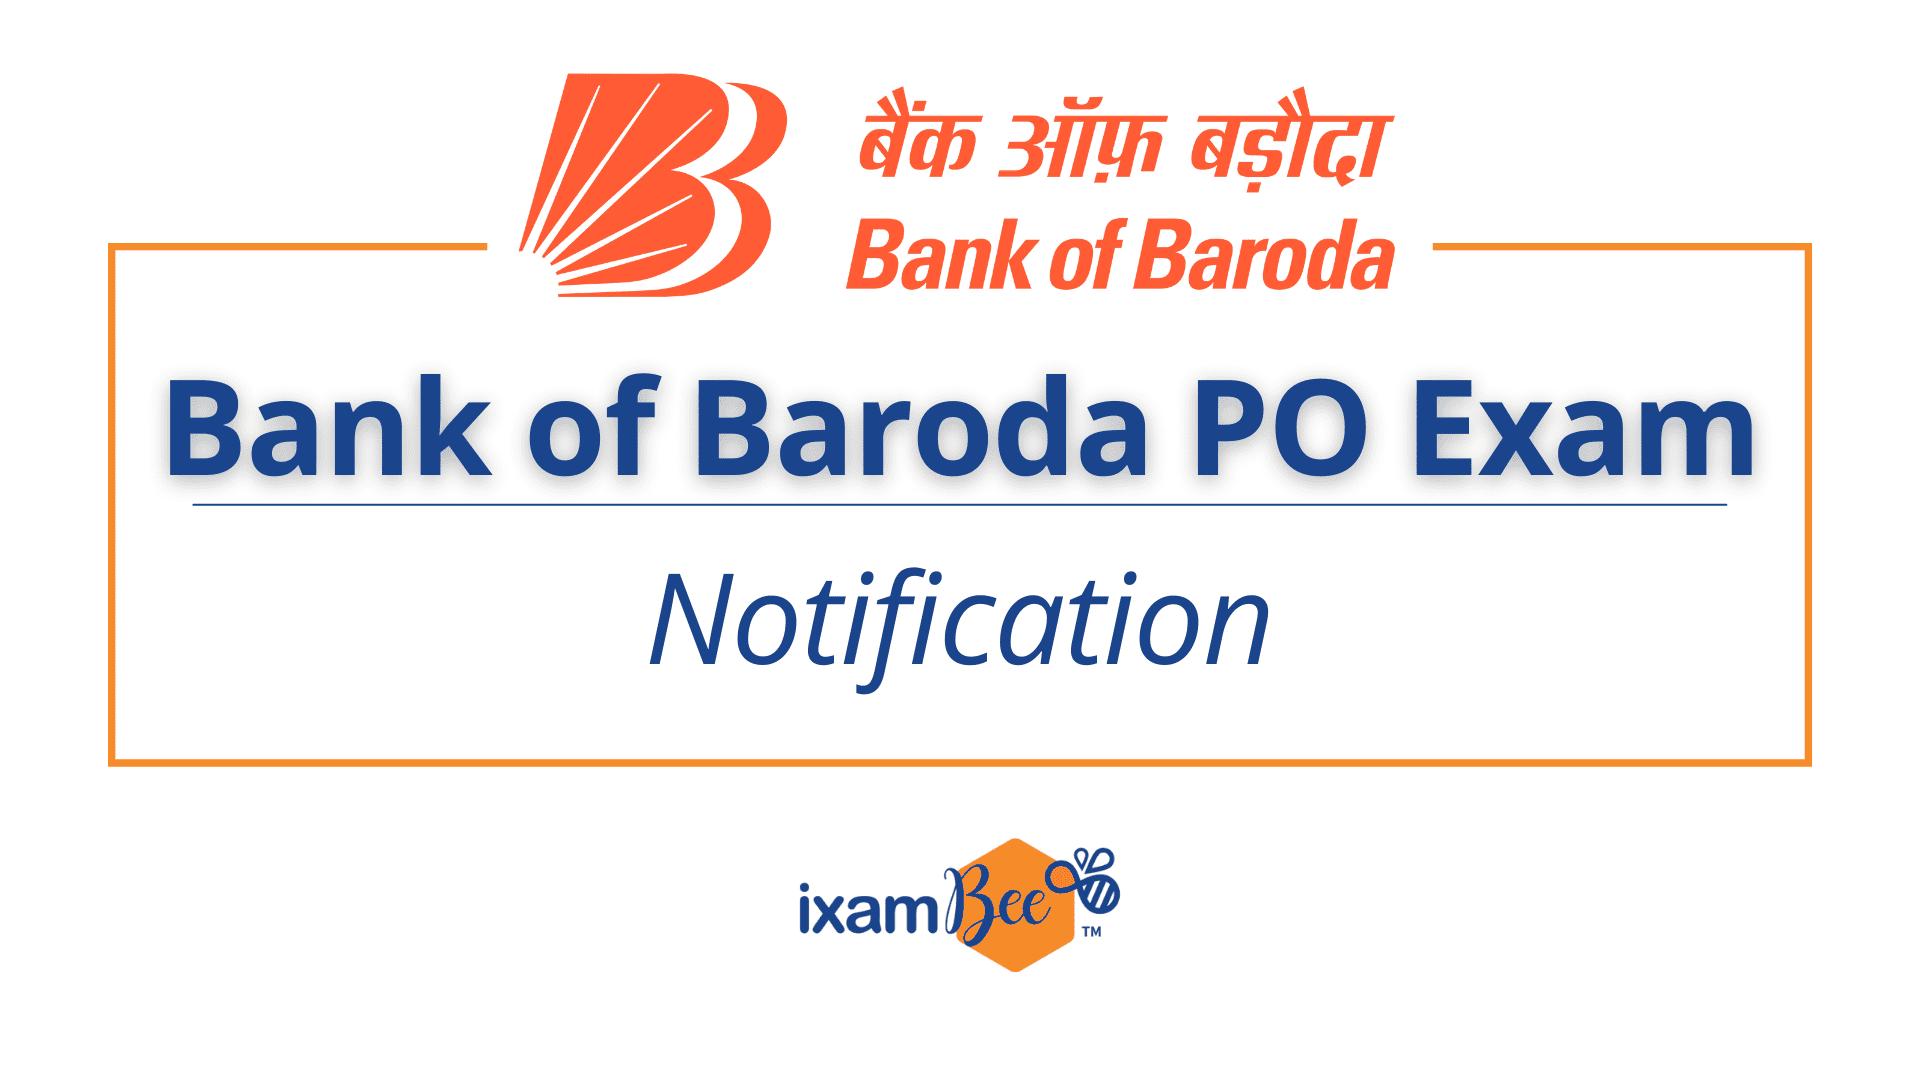 Bank of Baroda PO Exam Notification